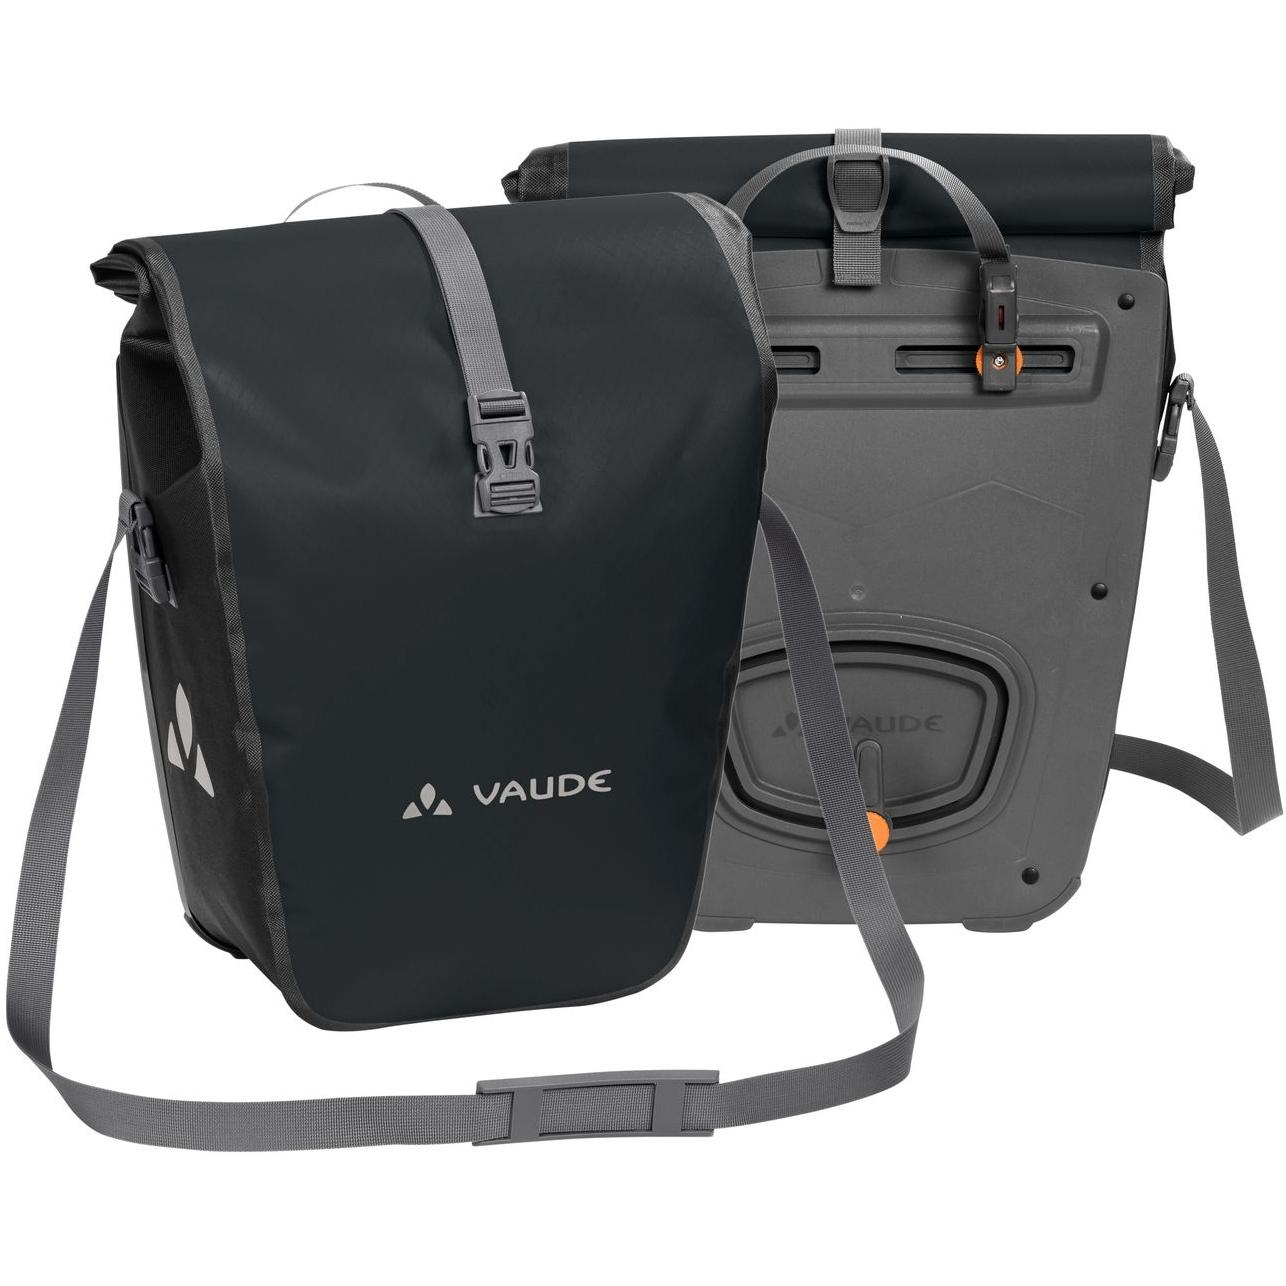 Bild von Vaude Aqua Back Fahrradtasche (Paar) - black